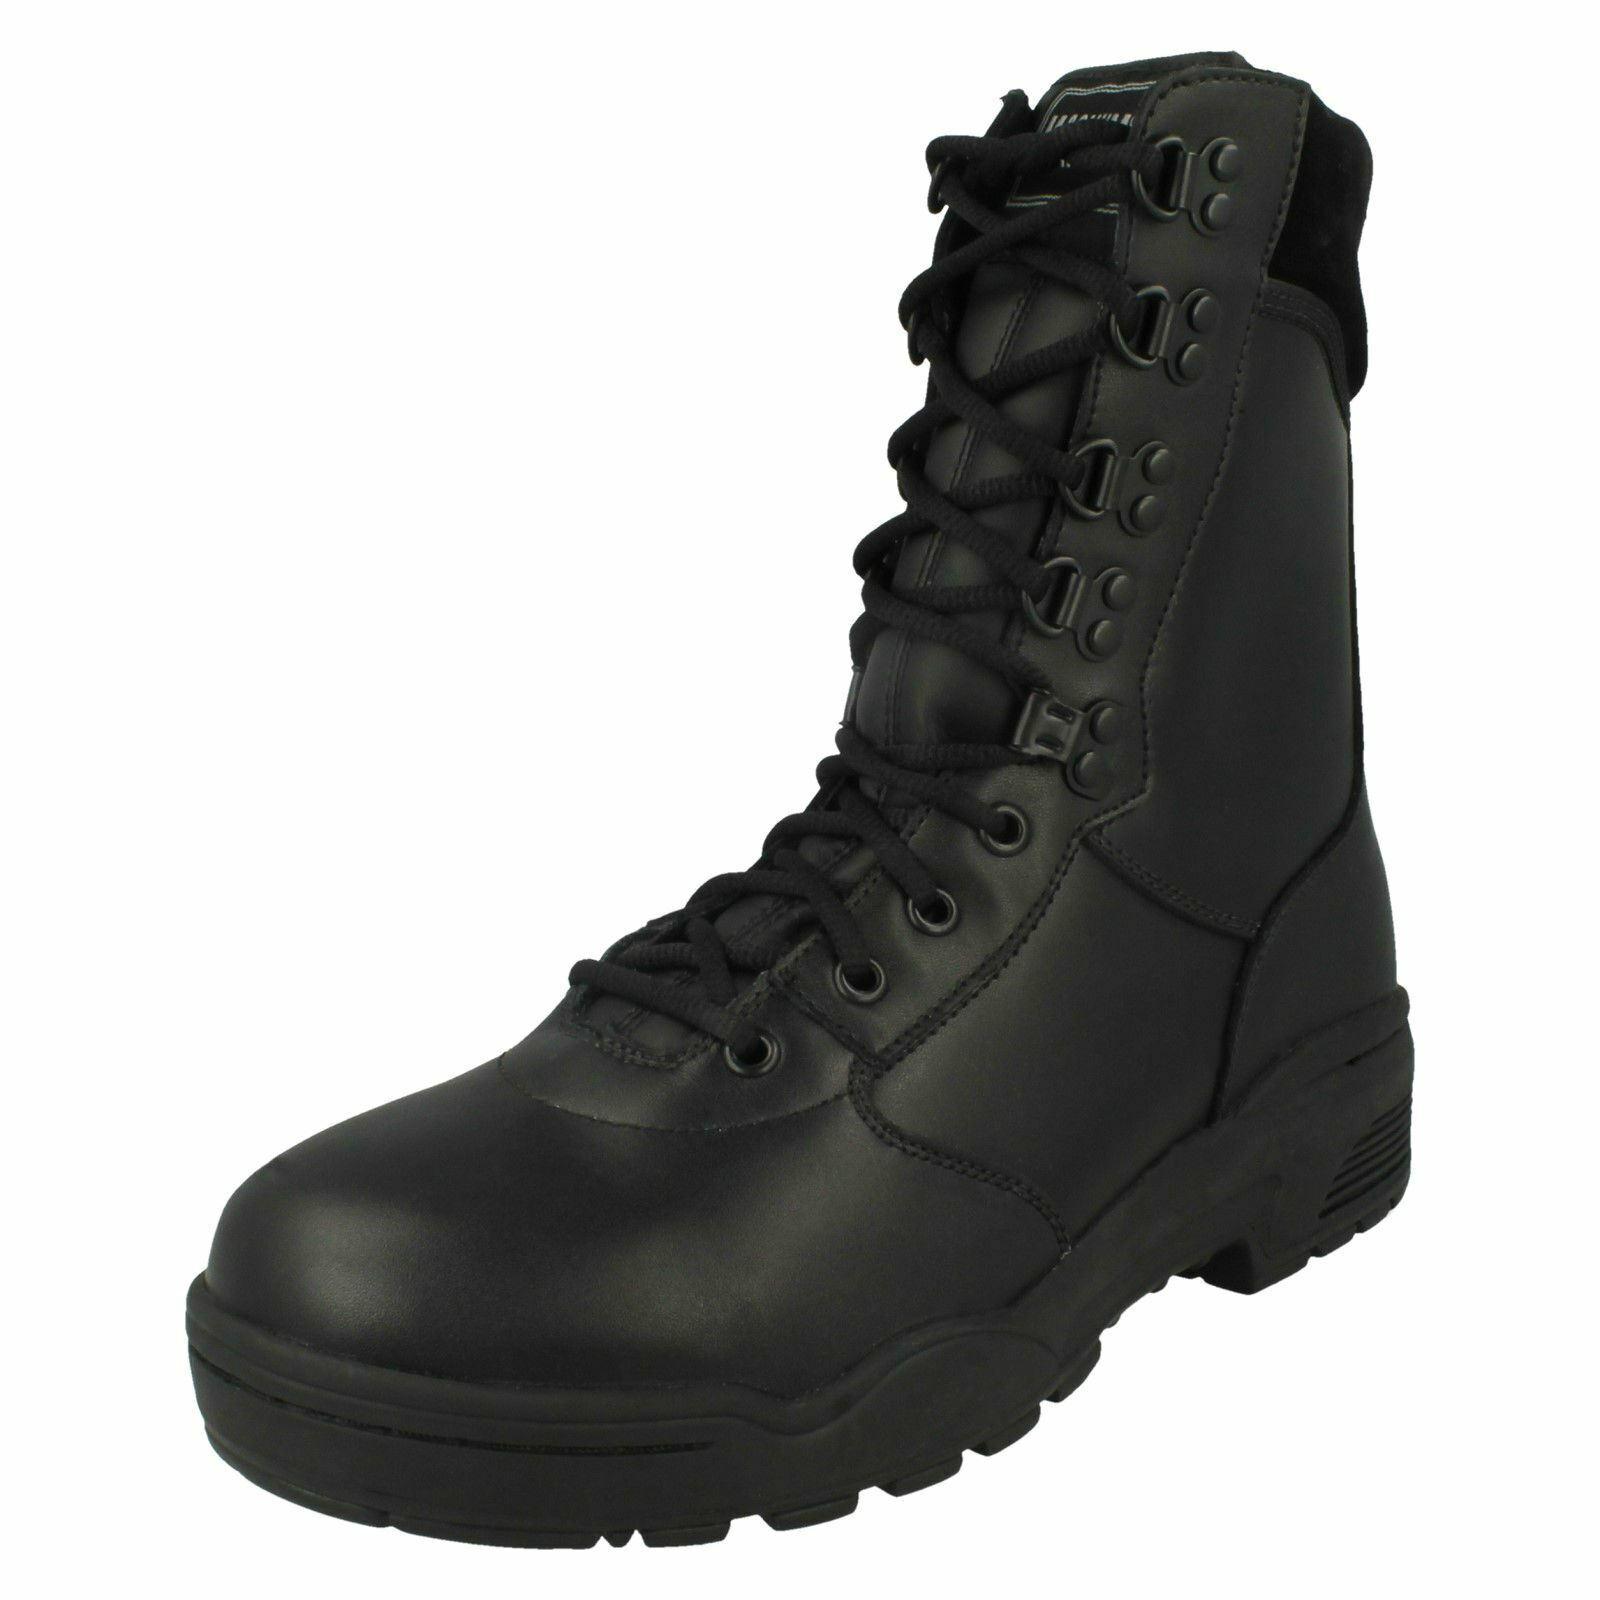 Mens Magnum Leather Cen Combat Style Stiefel